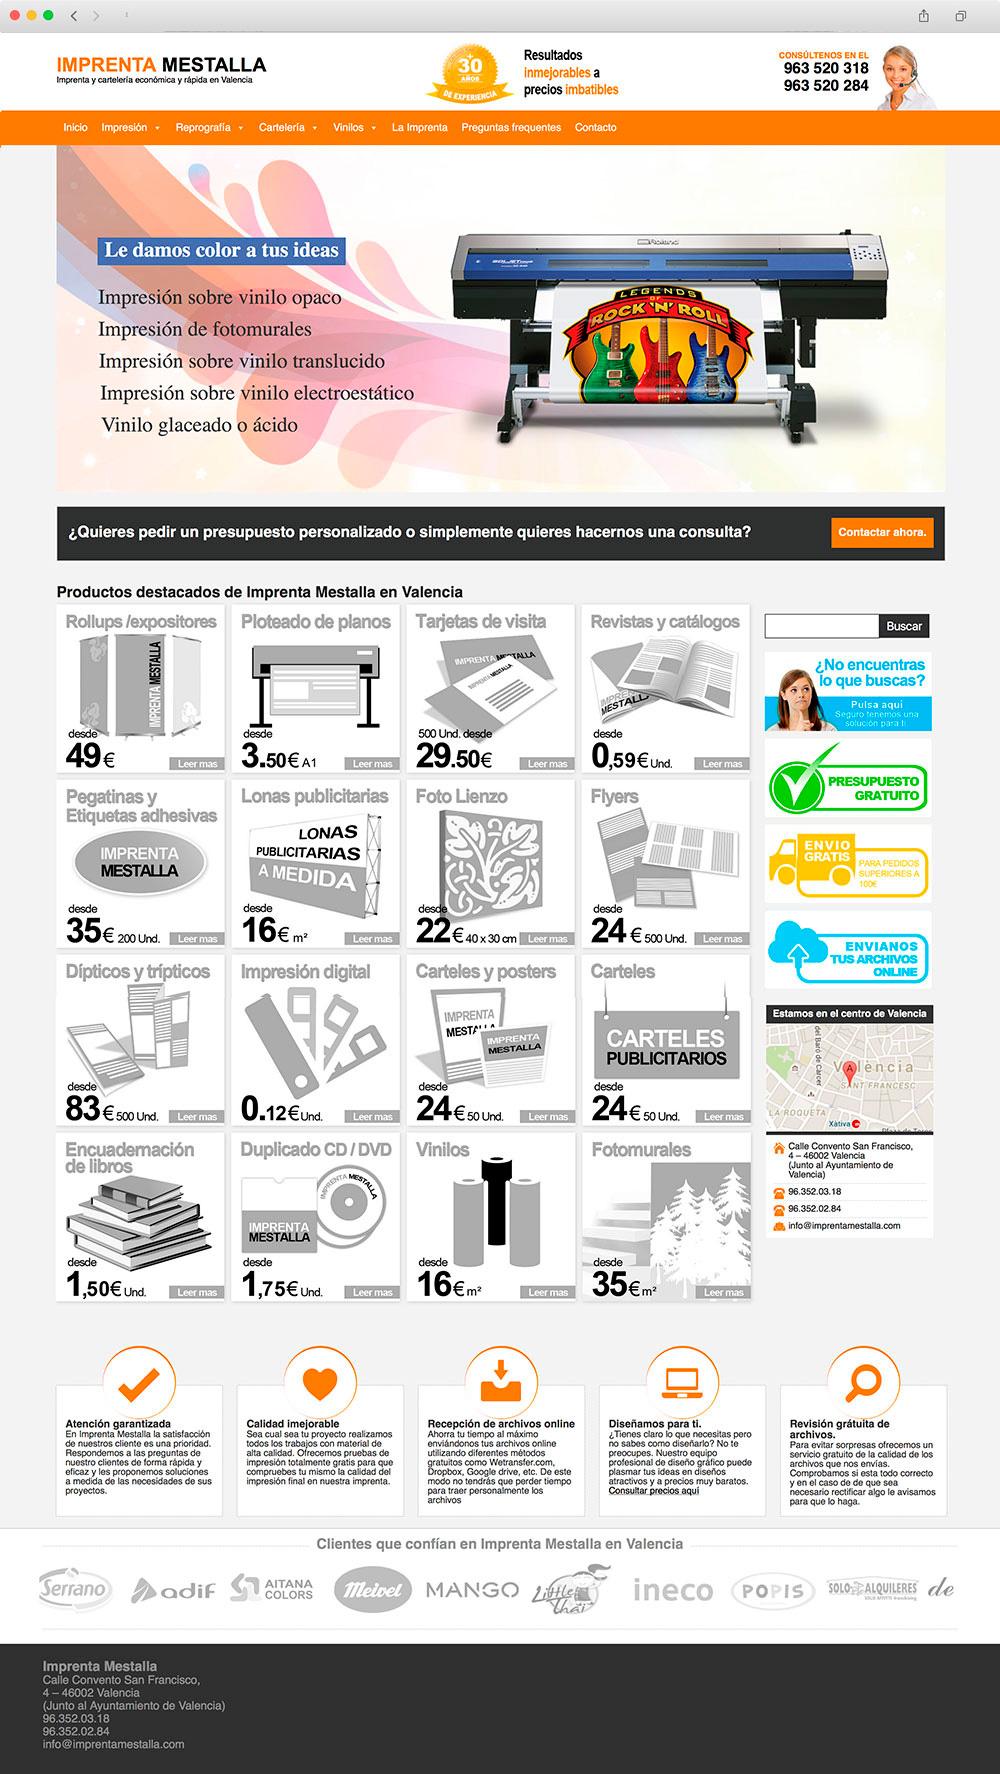 Diseño Web corporativo para Imprenta Mestalla en Valencia